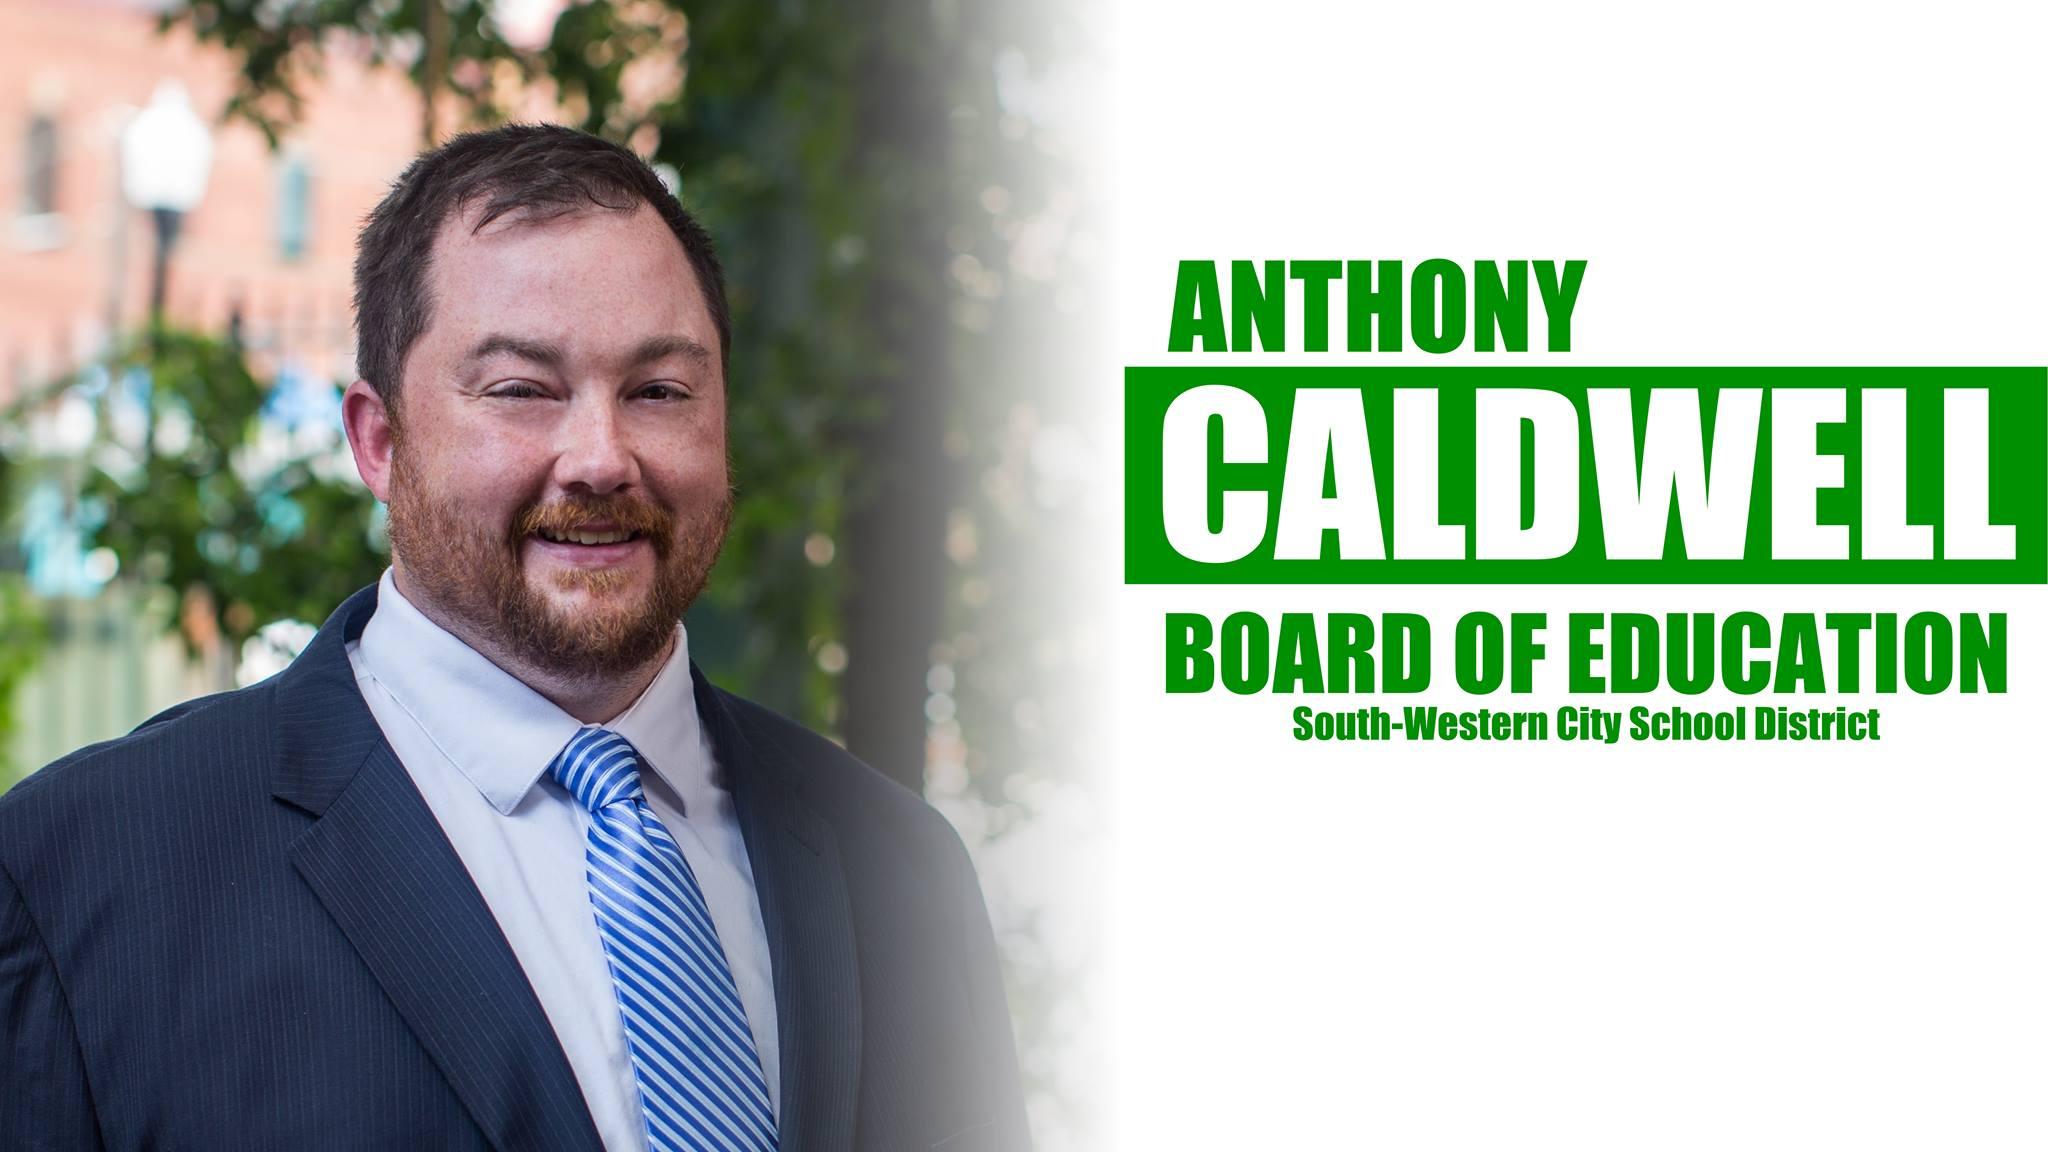 Anthony Caldwell